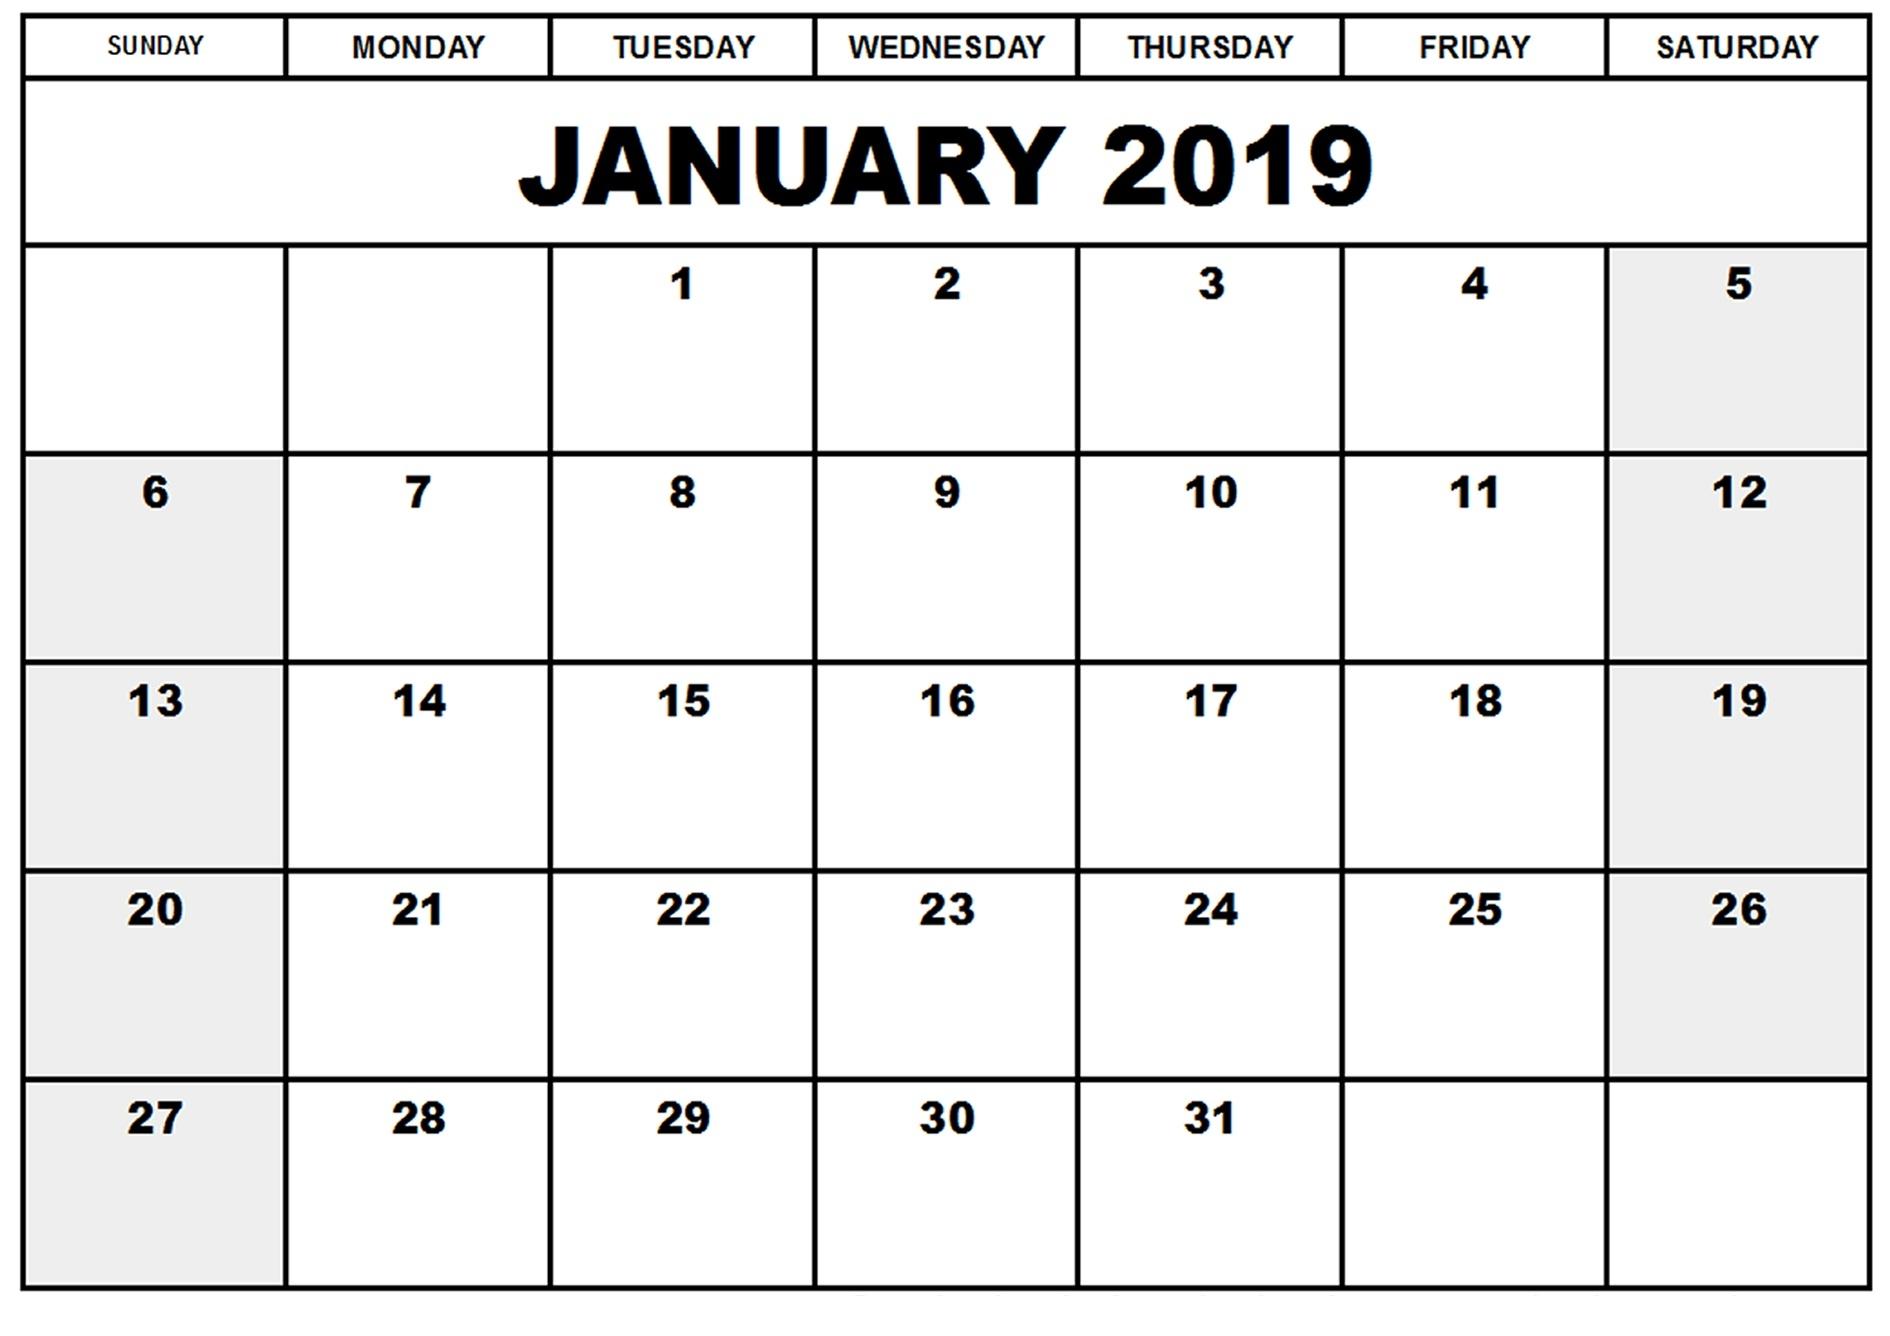 January 2019 Printable Calendar Template Pdf Excel Word January